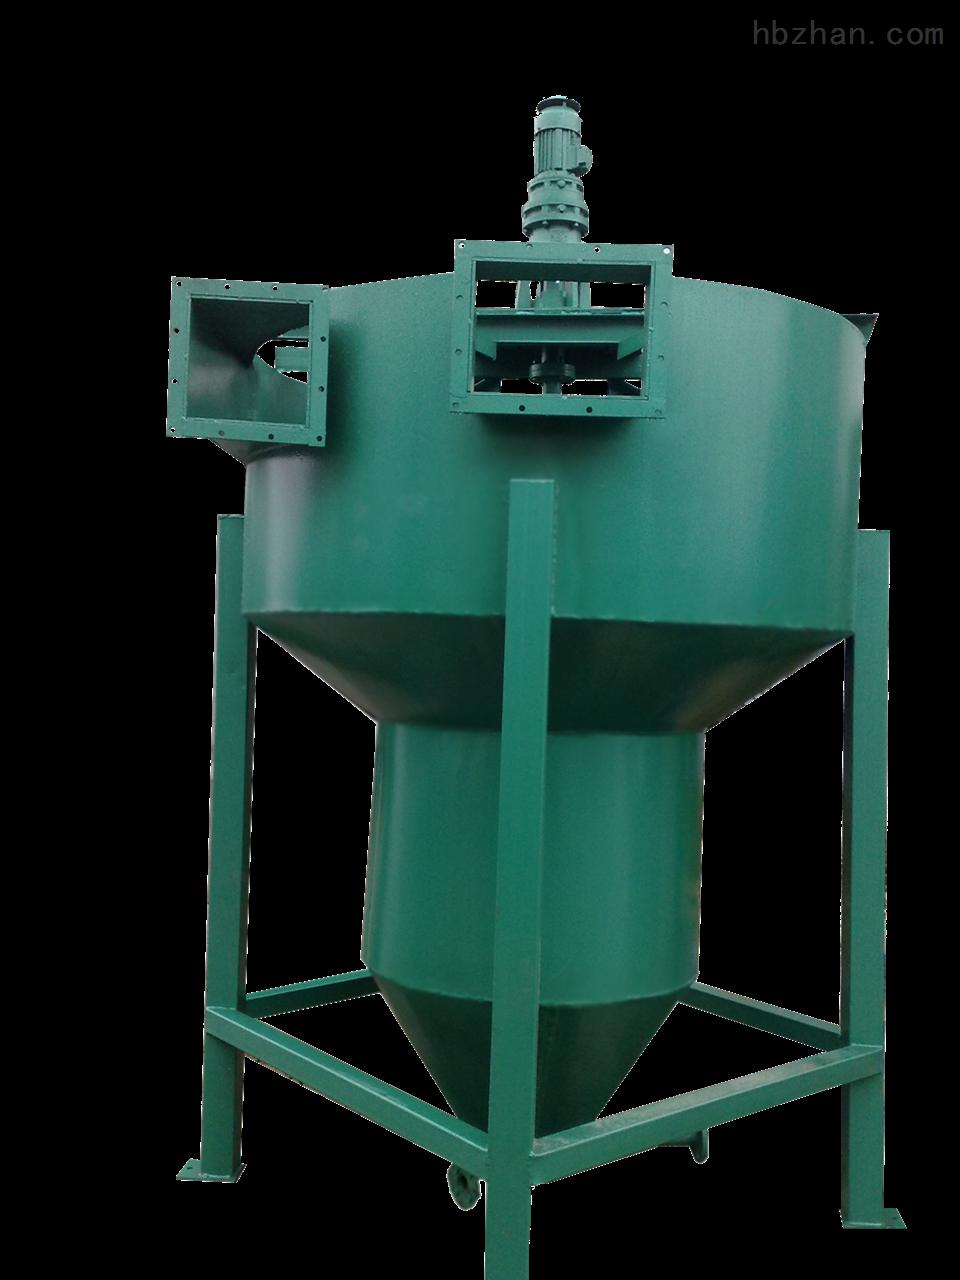 XLCS-180旋流沉砂池除砂机,专业污水处理设备